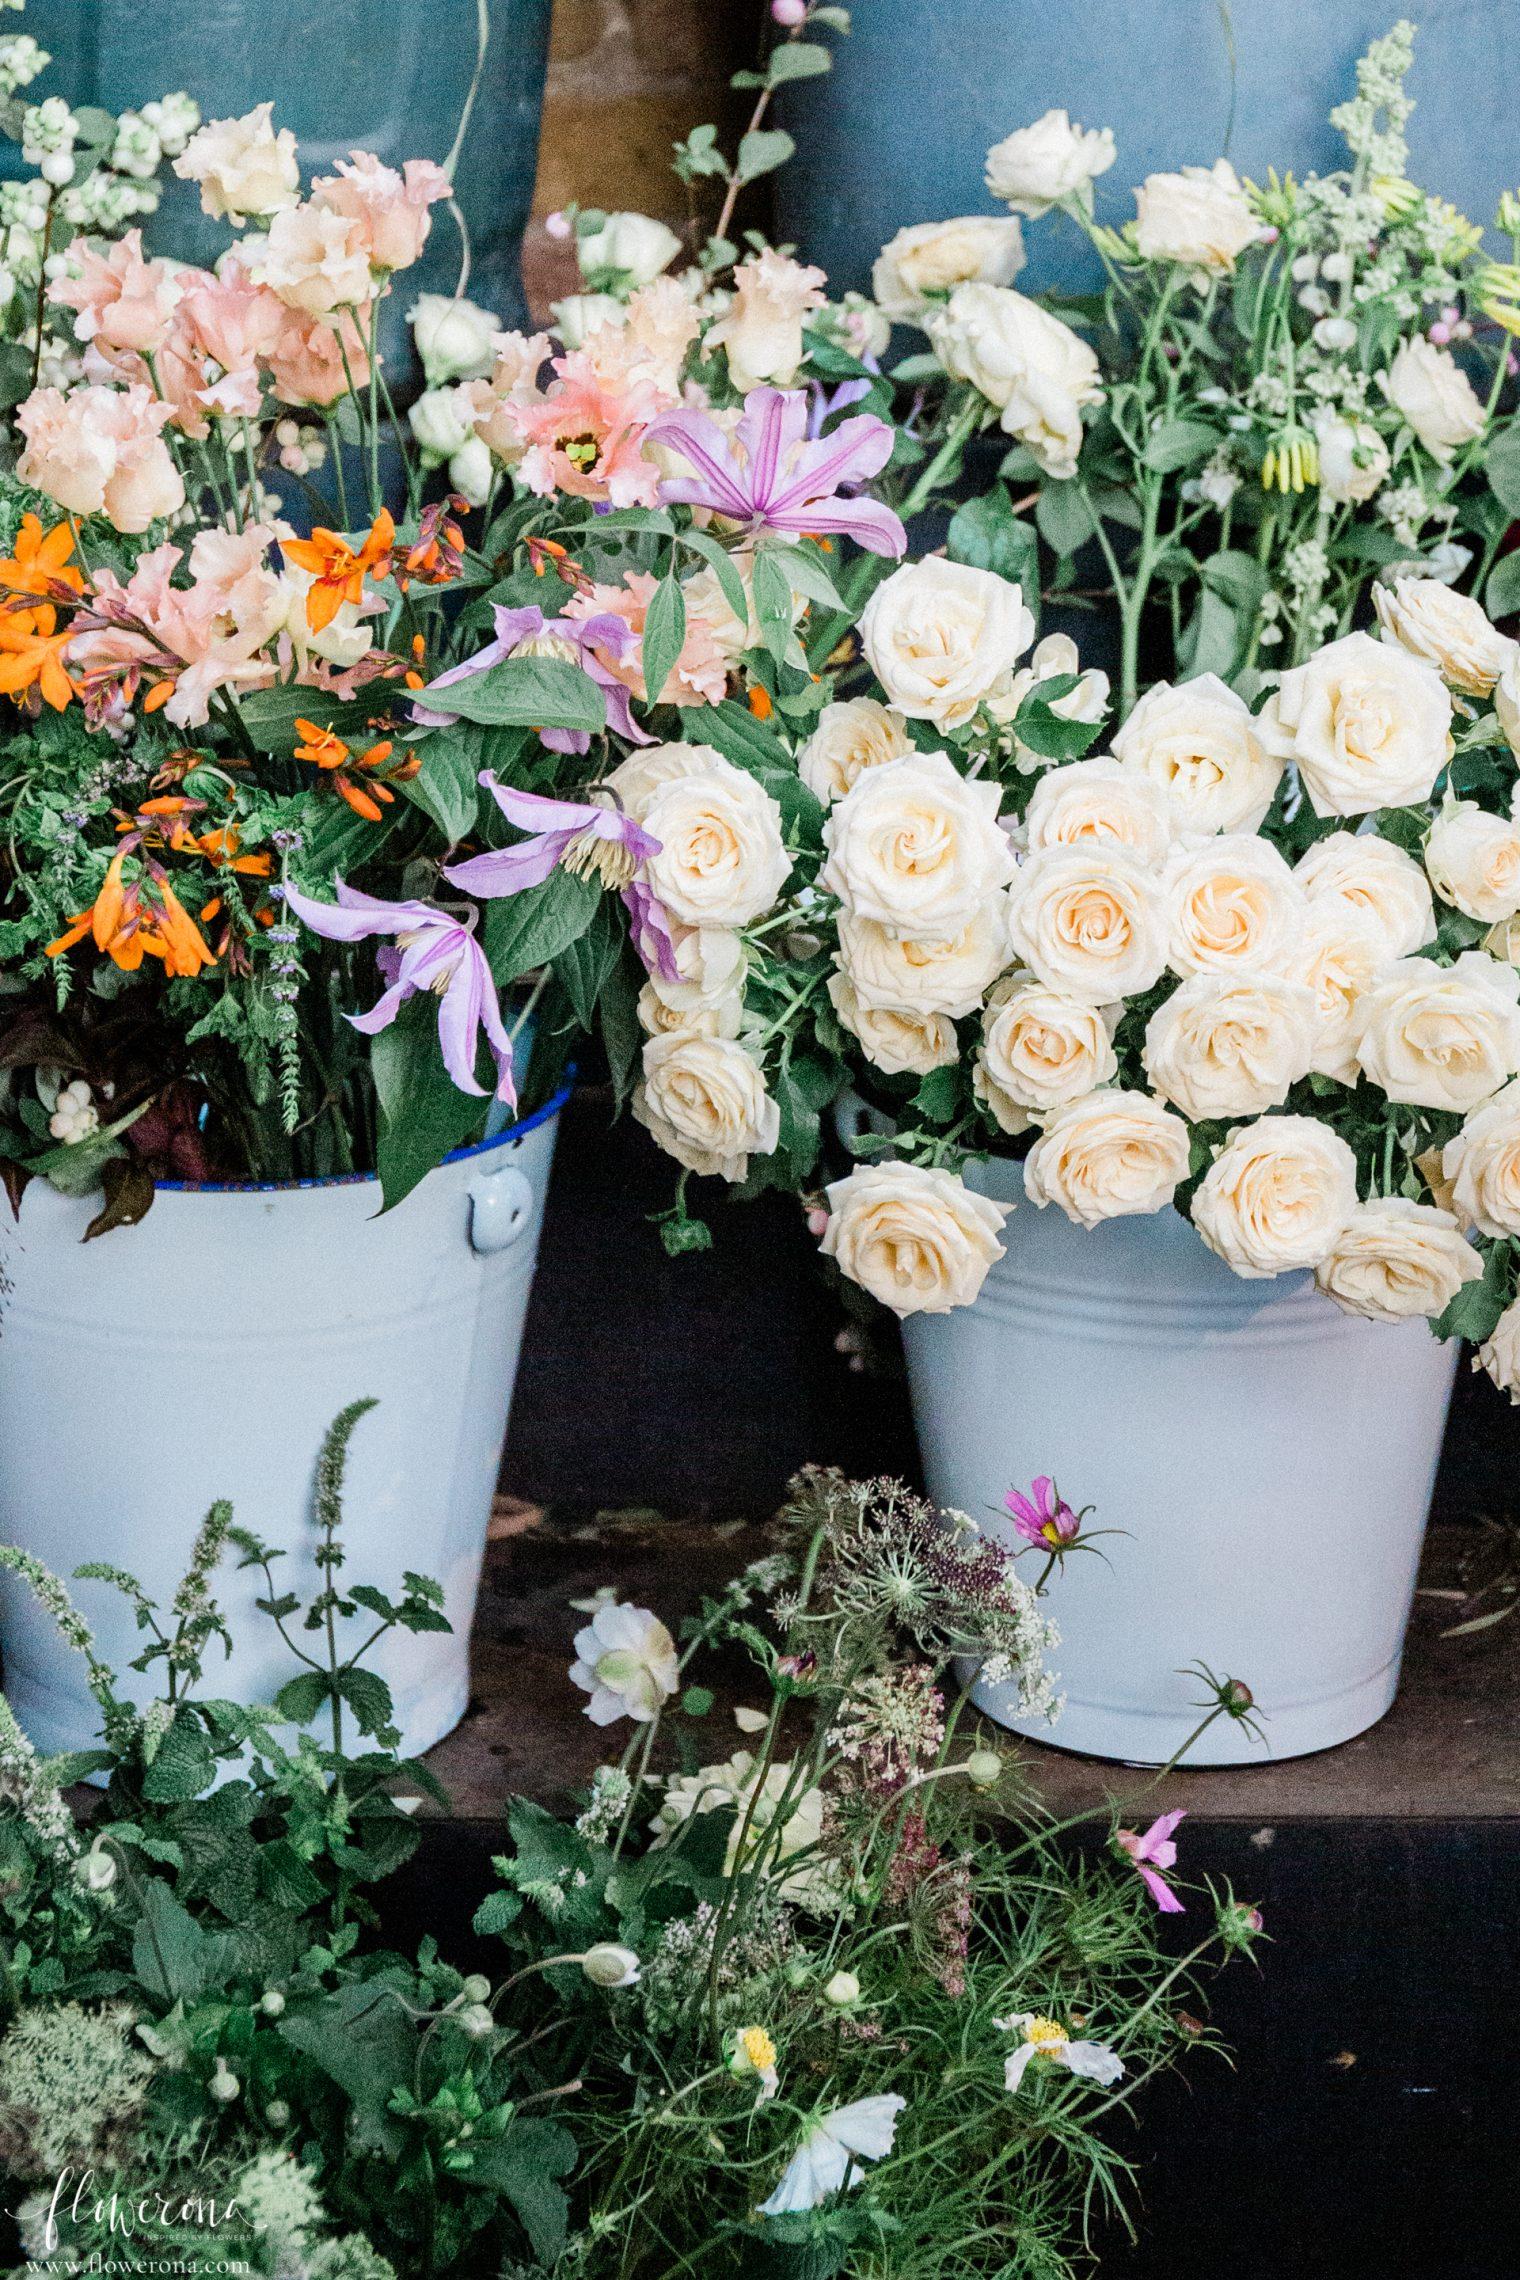 Fresh Flowers at the JamJar Flowers Studio